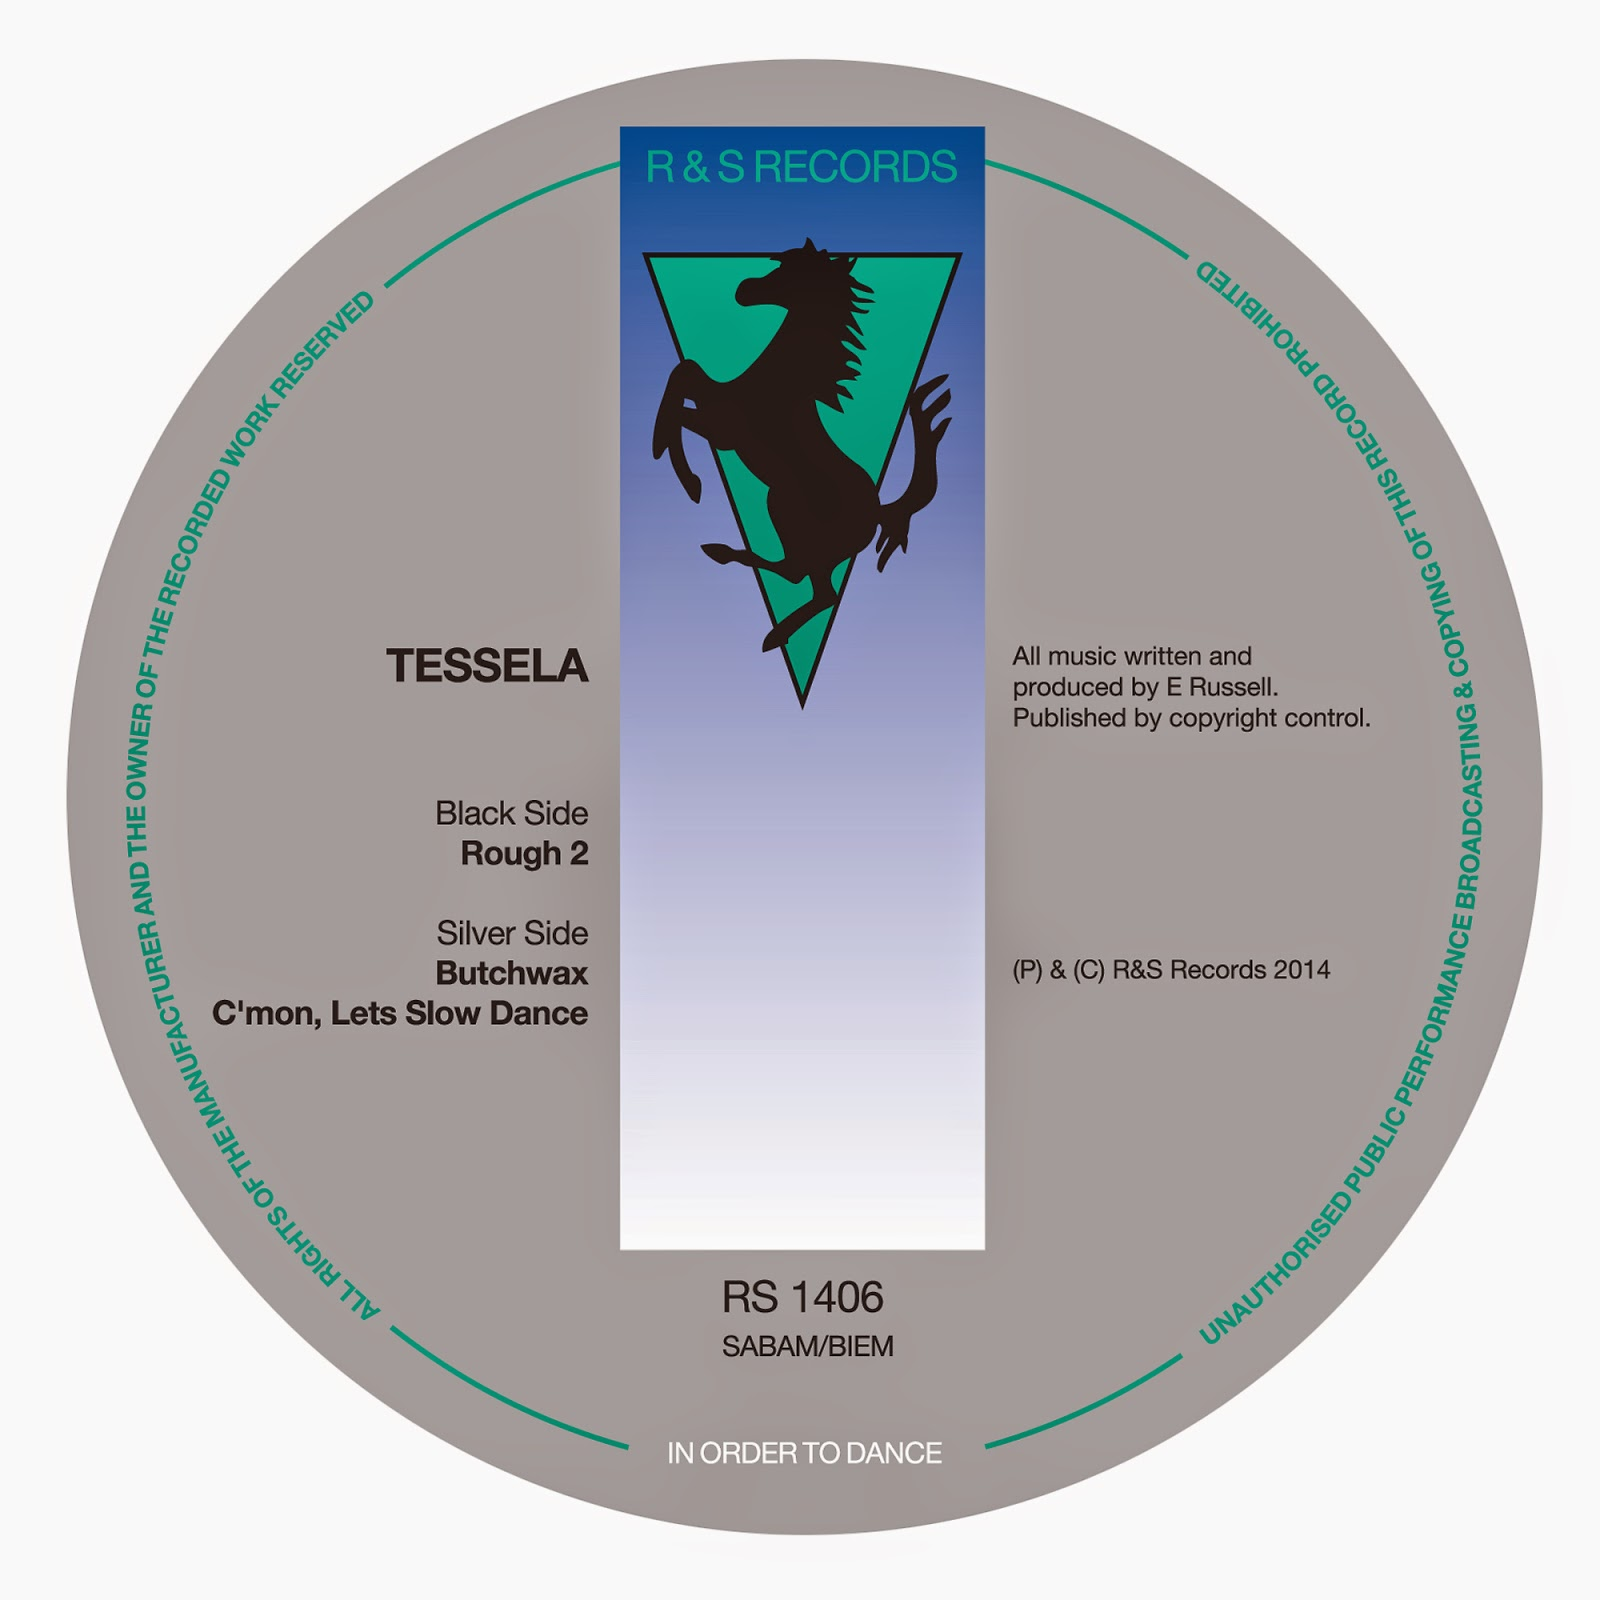 discosafari - TESSELA - Rough 2 - R & S Records